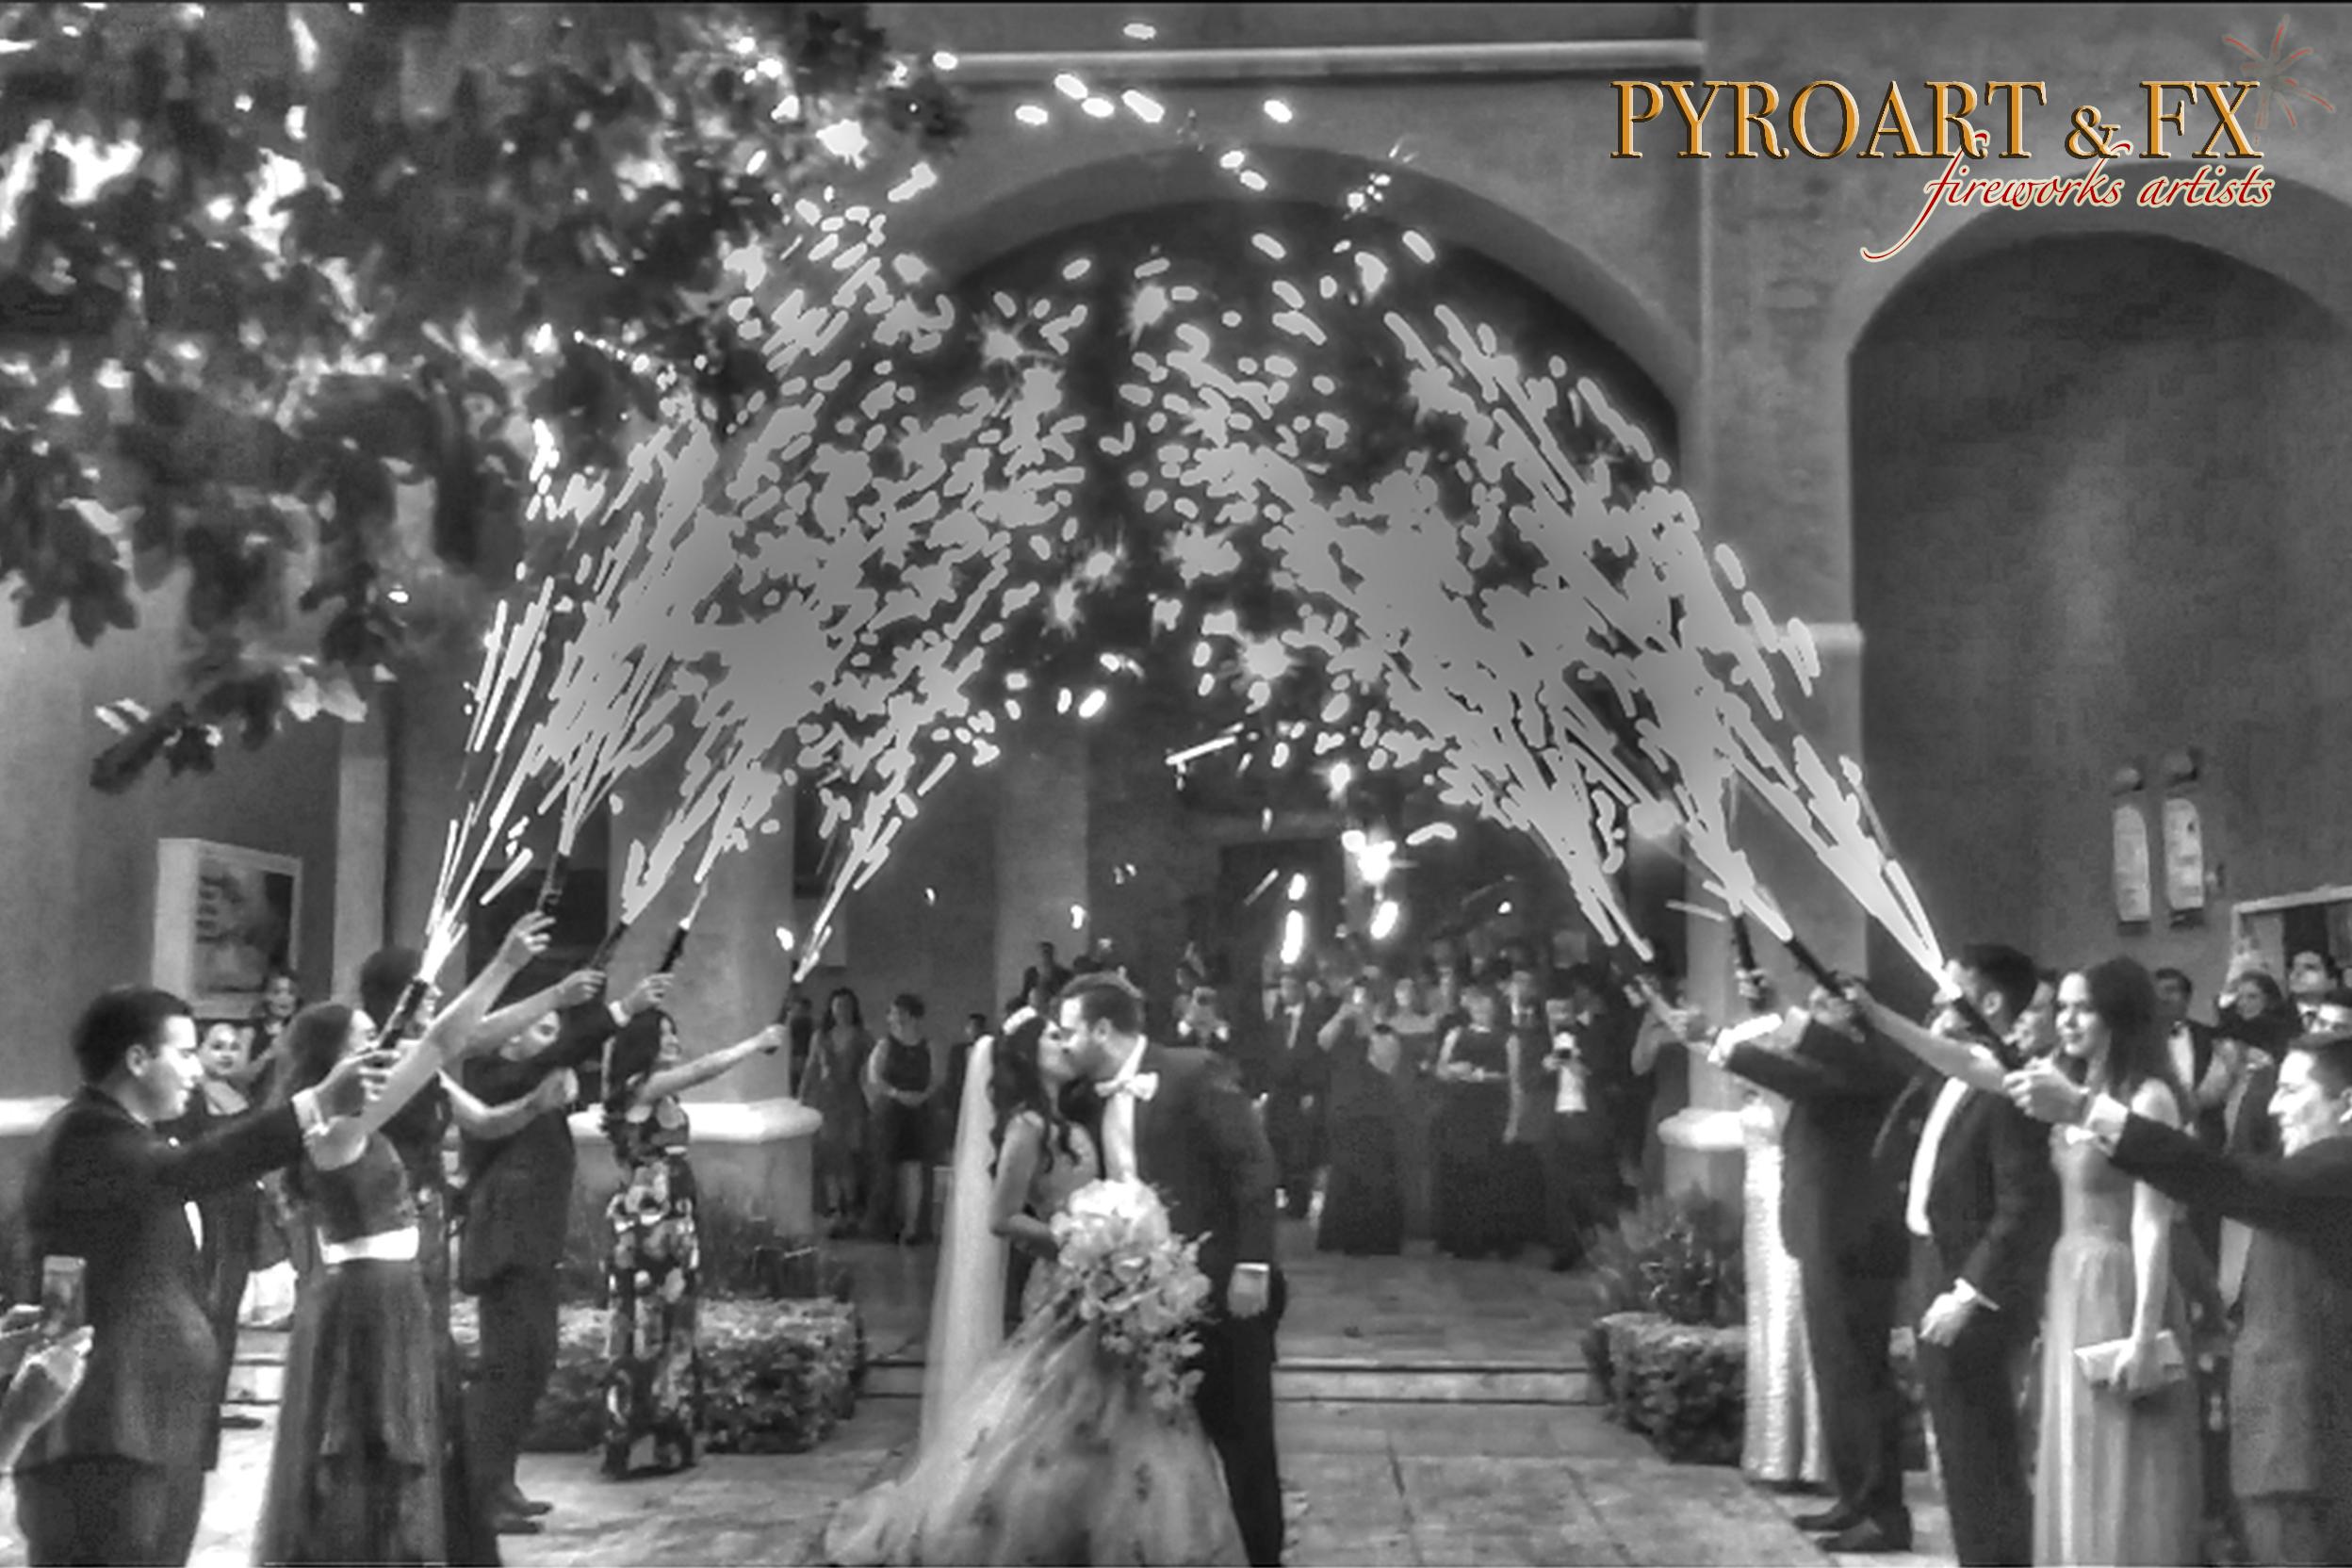 PYROART & FX - CHISPEROS DE MANO REINA D